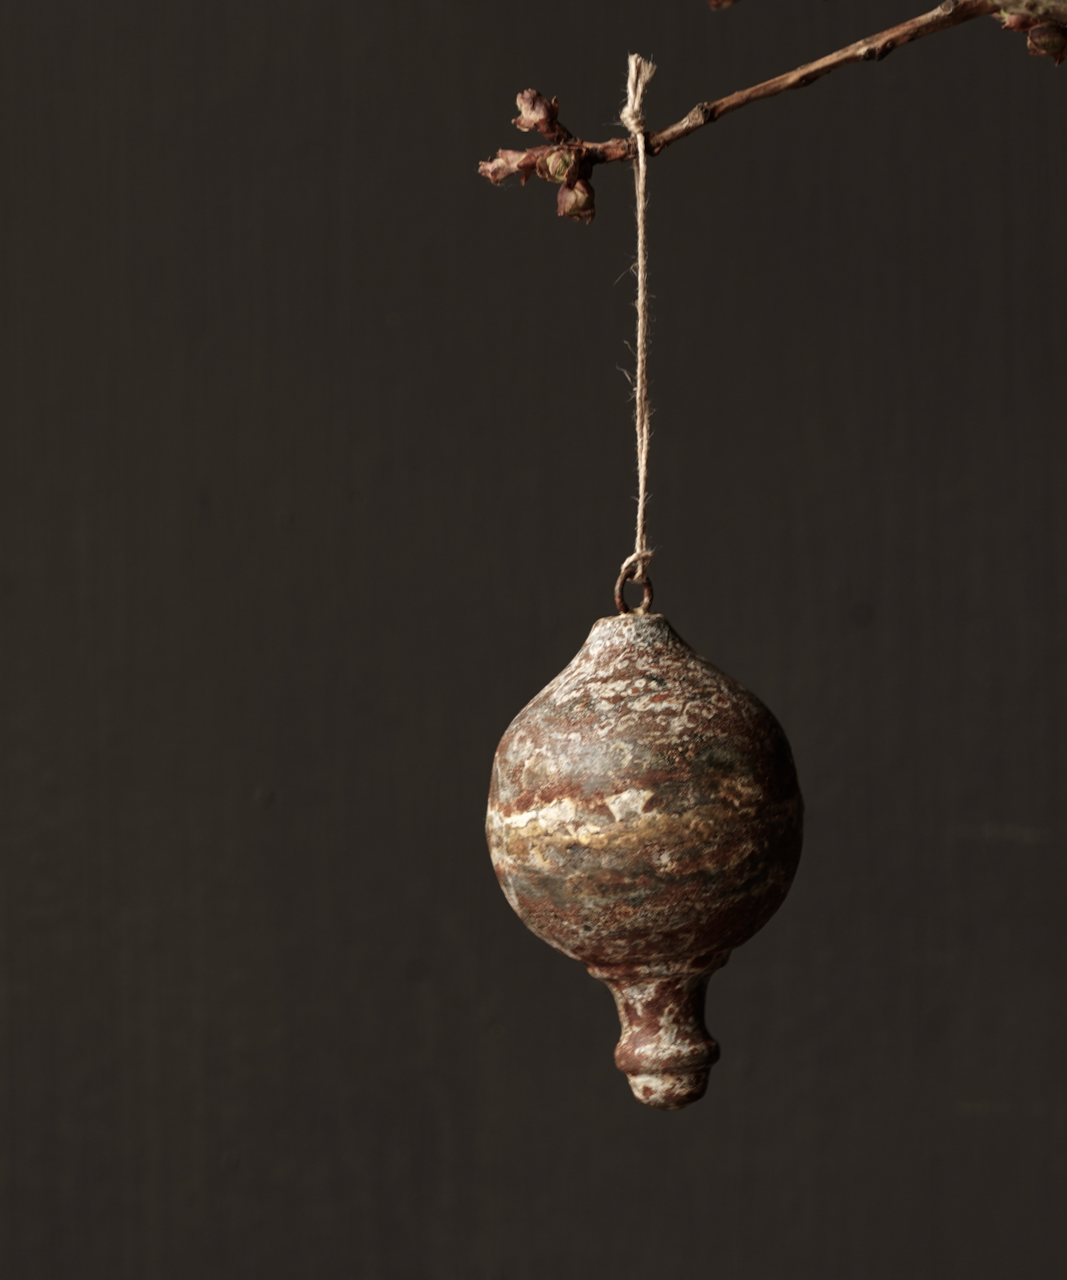 Iron Christmas Ornament Hanger Spool Spinning Top-10